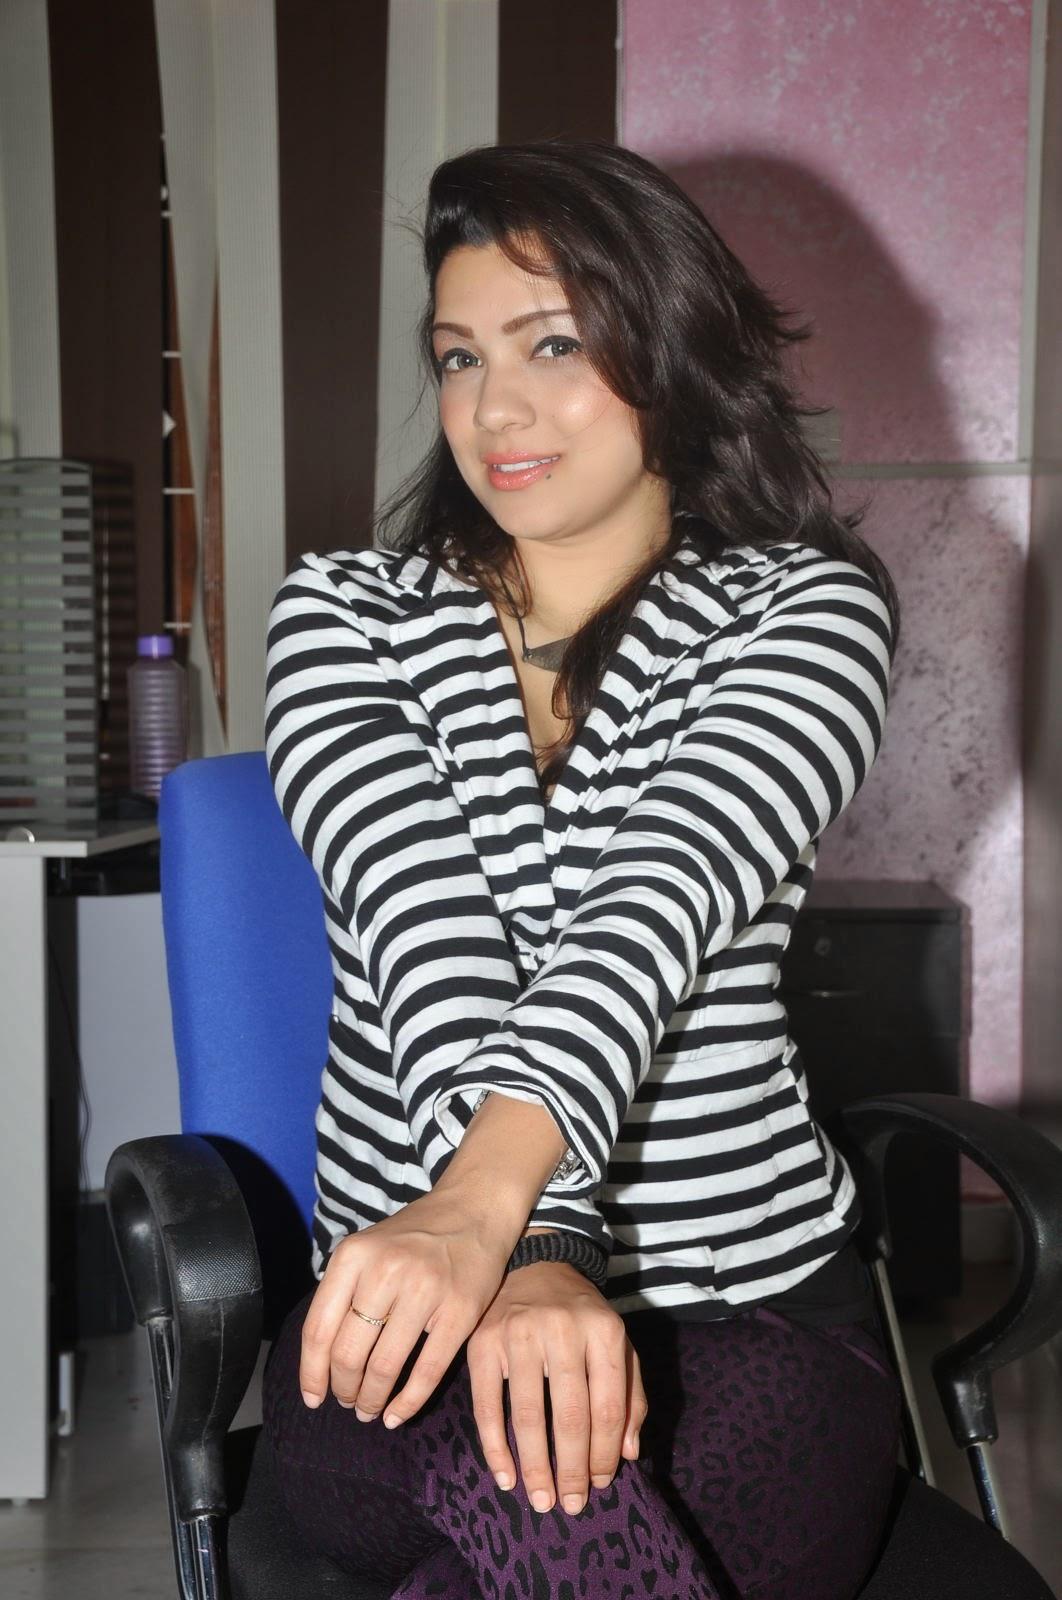 Actress Pari Nidhi Glam photos Gallery-HQ-Photo-1